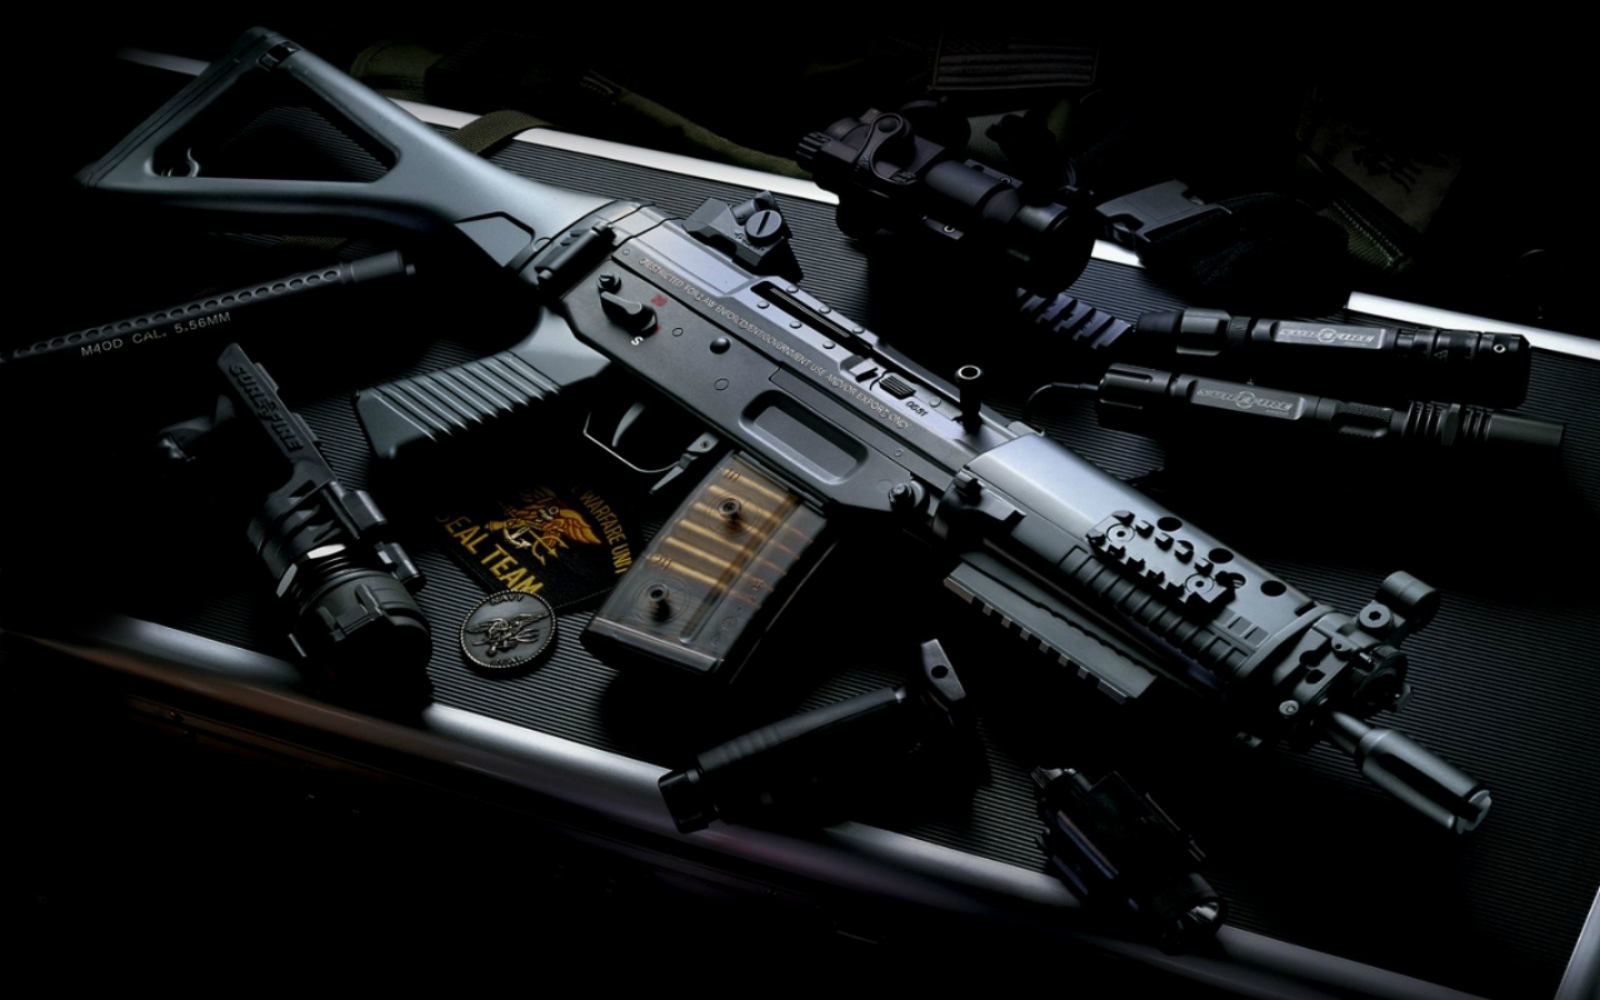 Guns Wallpaper Hd: Mp5 Machine Gun Photos HD Wallpapers